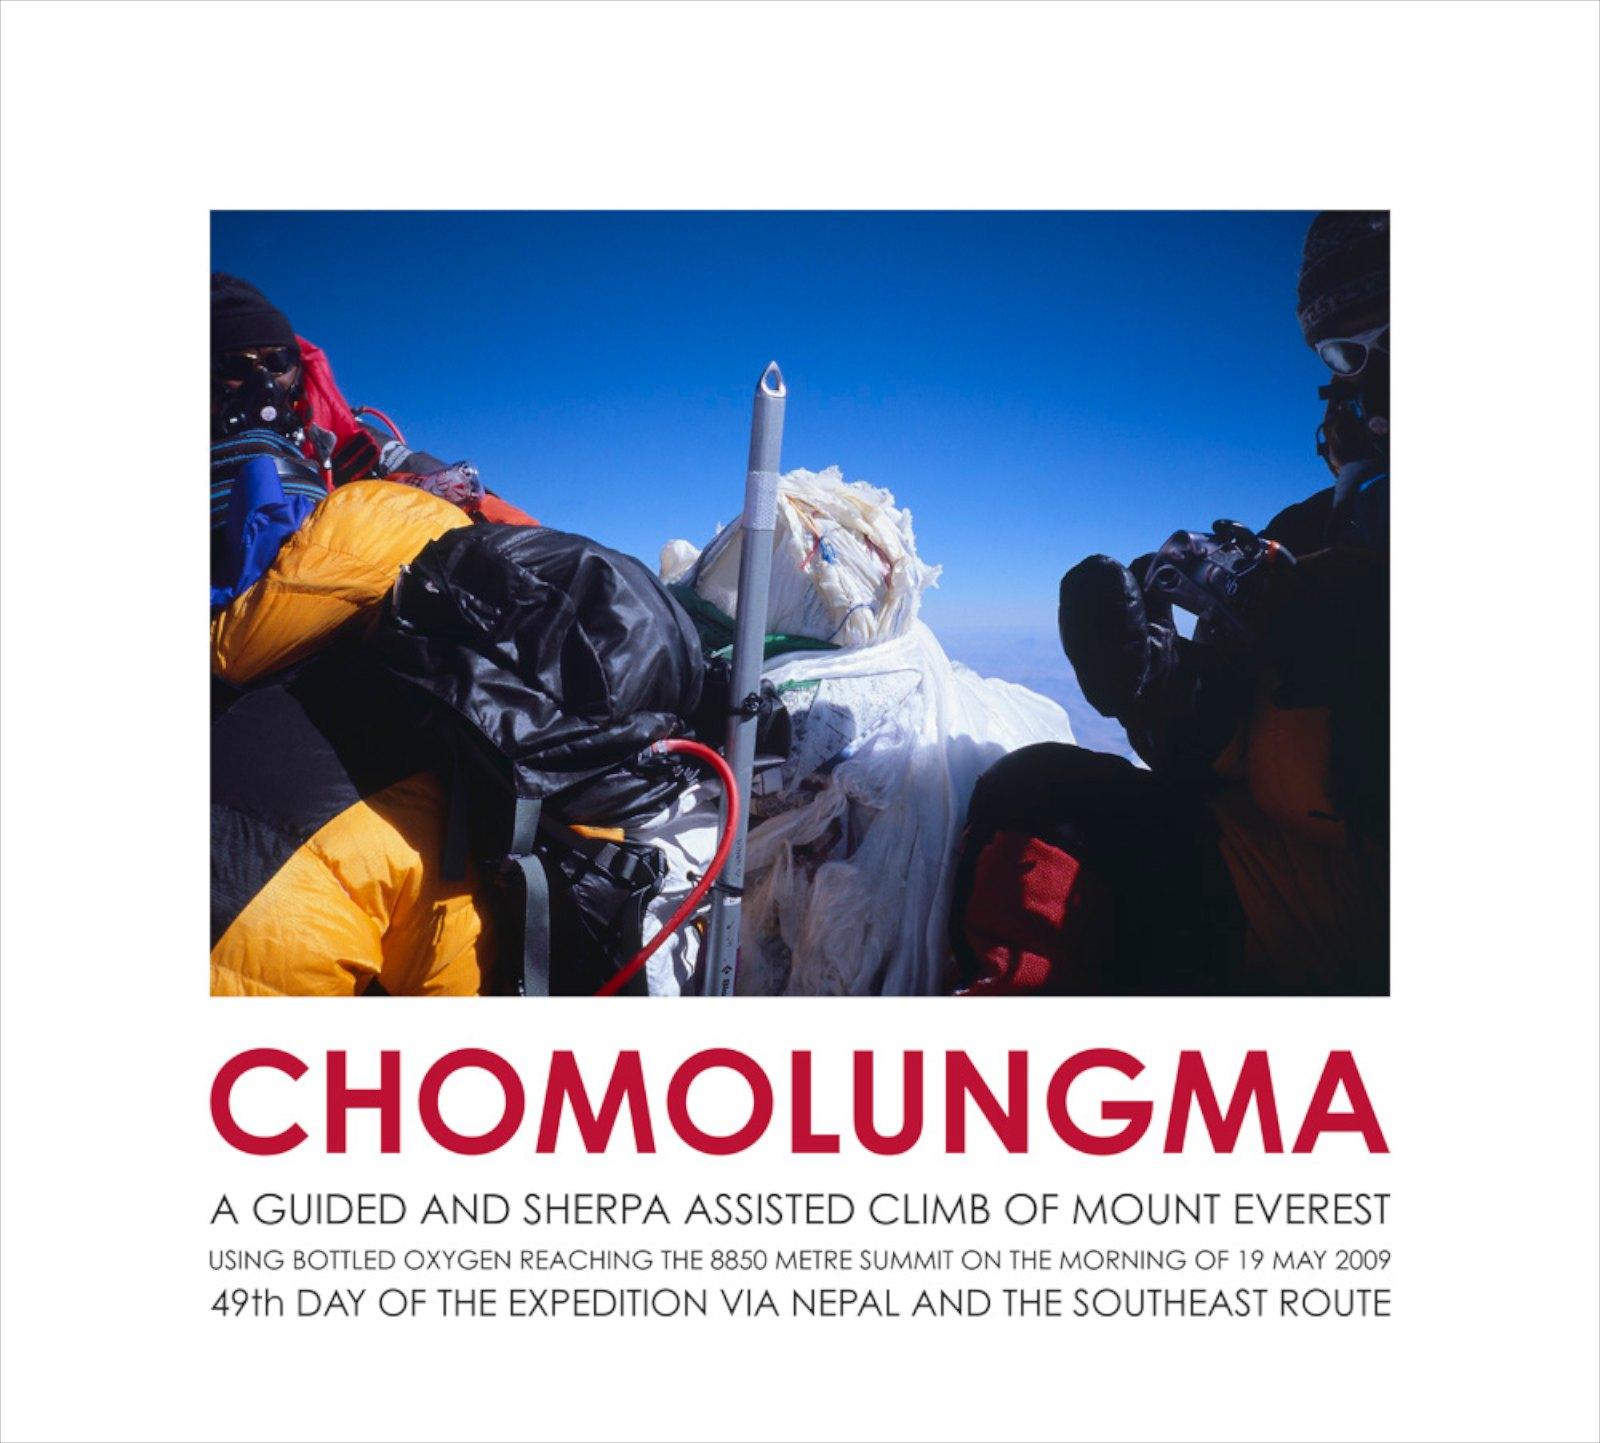 Chomolungma, Mount Everest Summit Photograph, 2009, giclée print, 55 x 61 cm